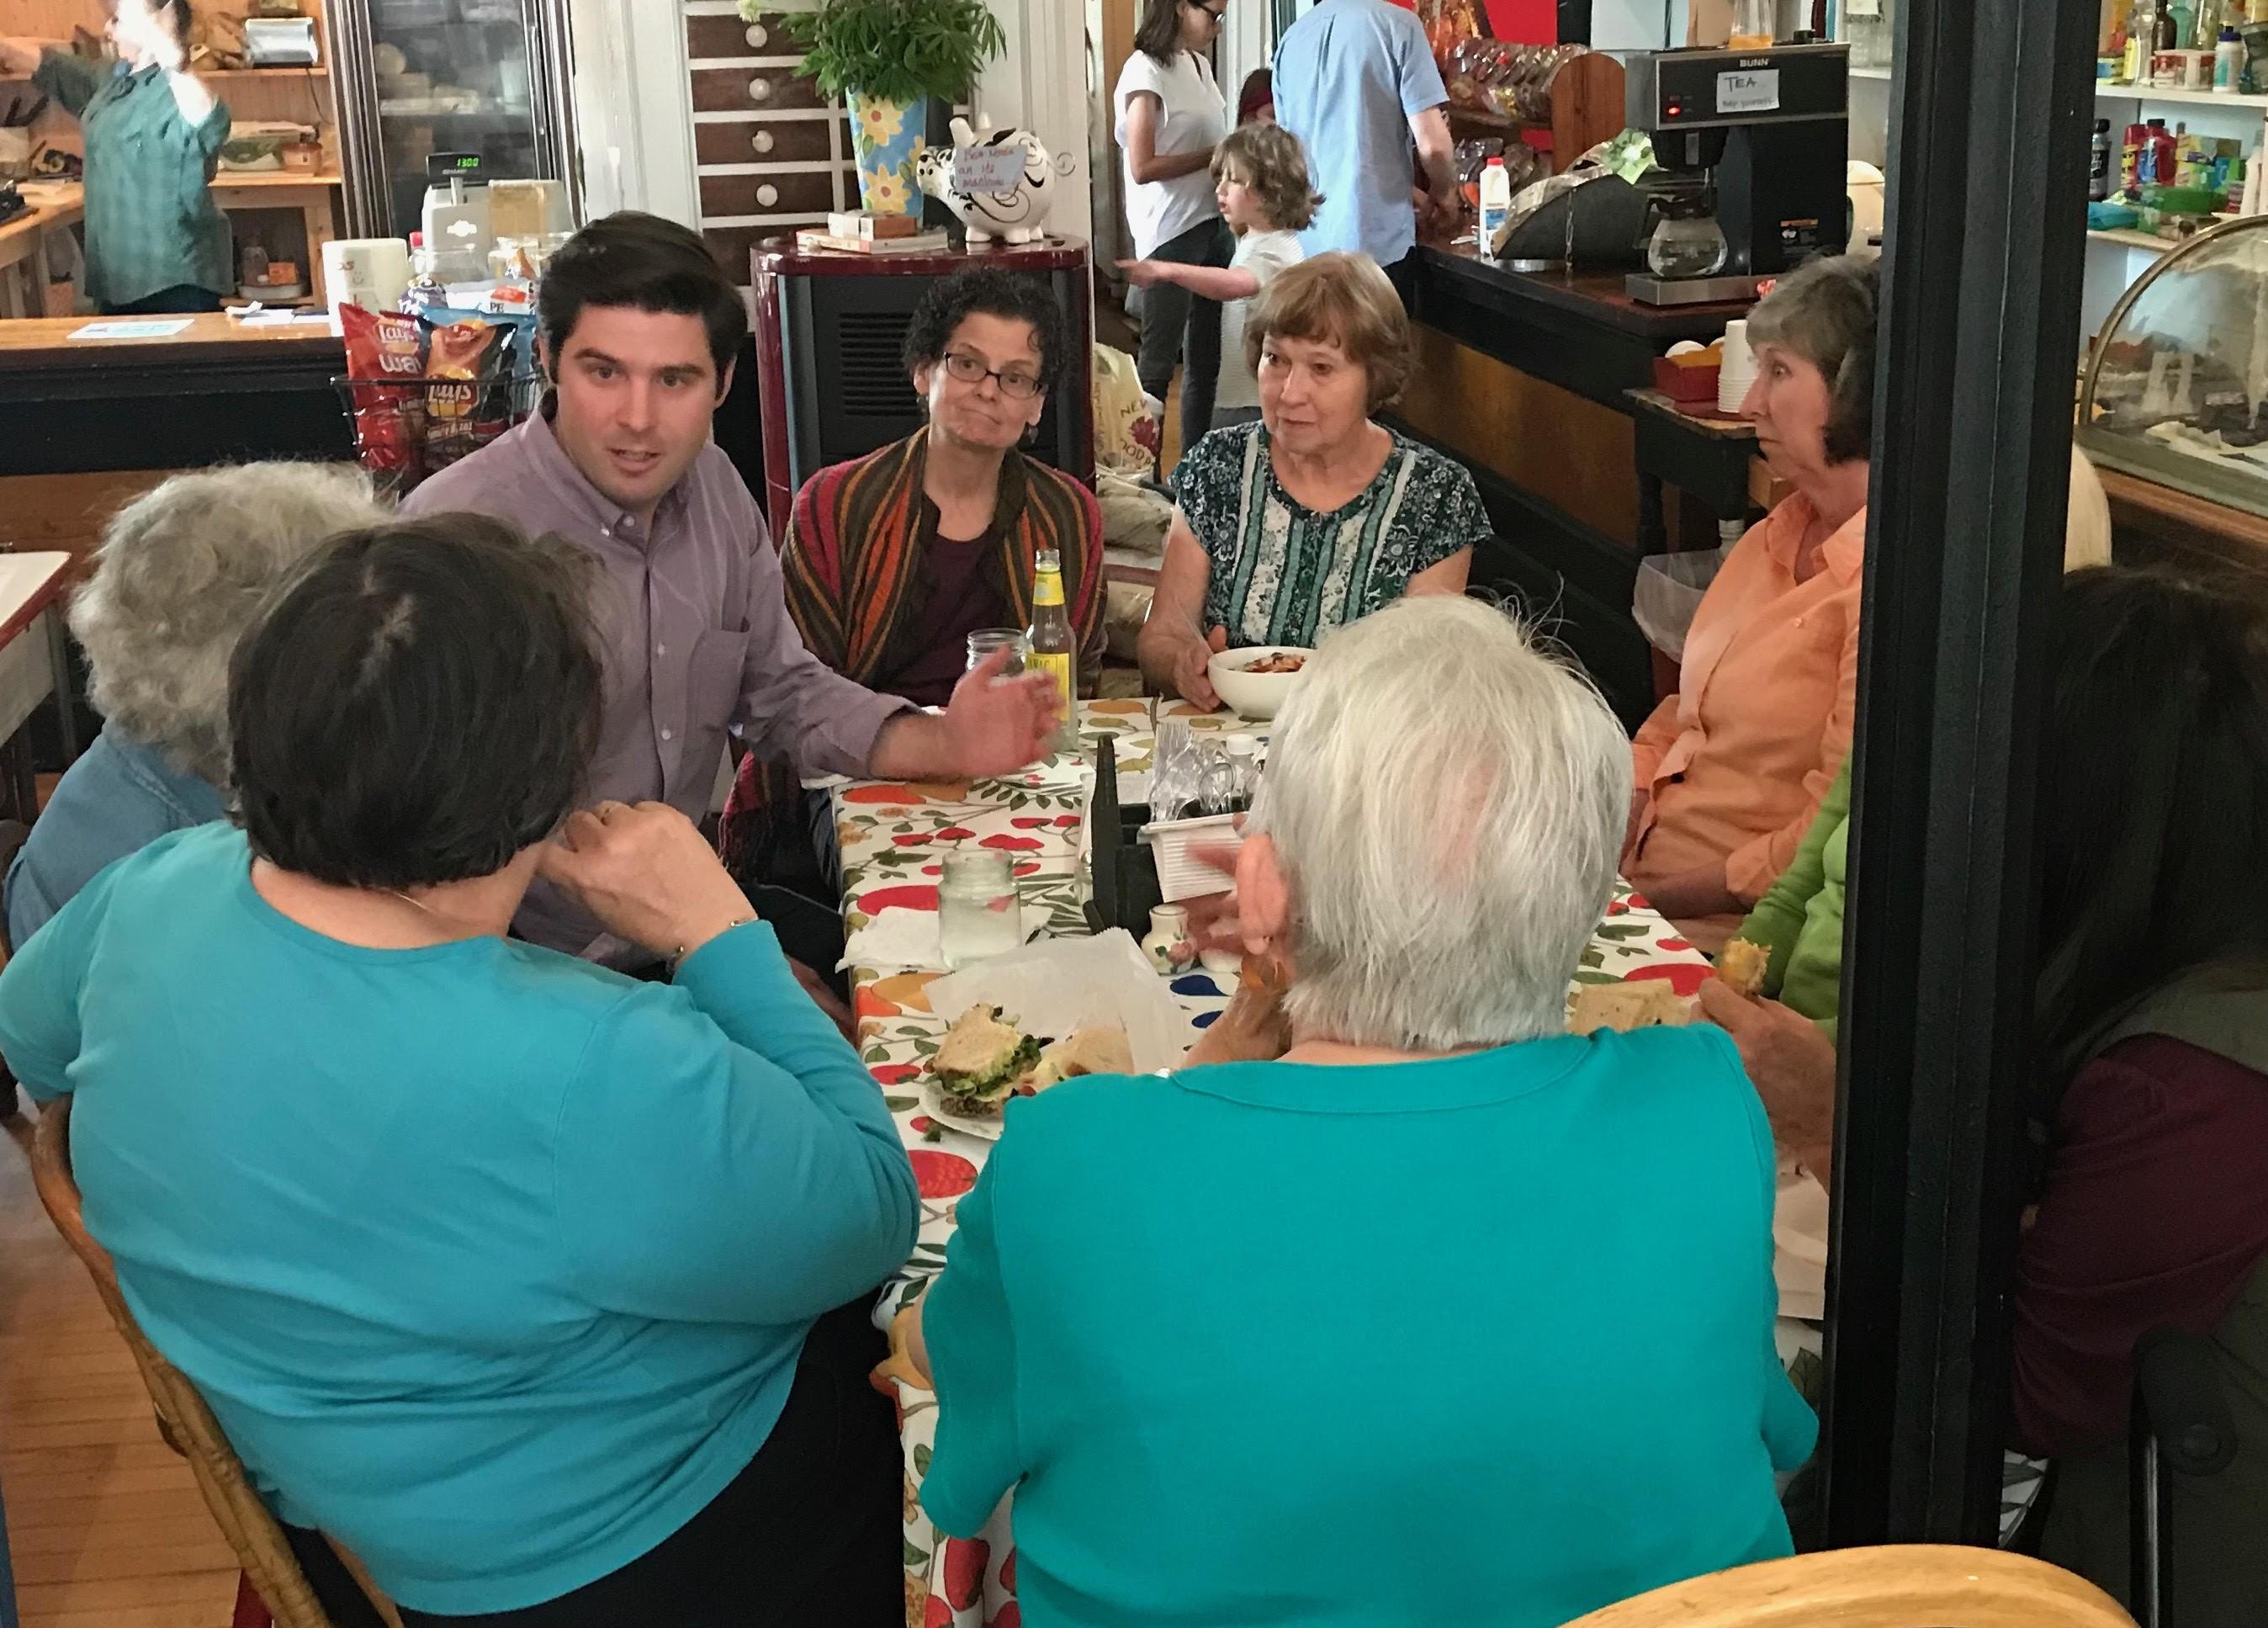 Gareth Rhodes campaigned heavily in rural communities like Bovina in Delaware County. - ANDREW SOLENDER